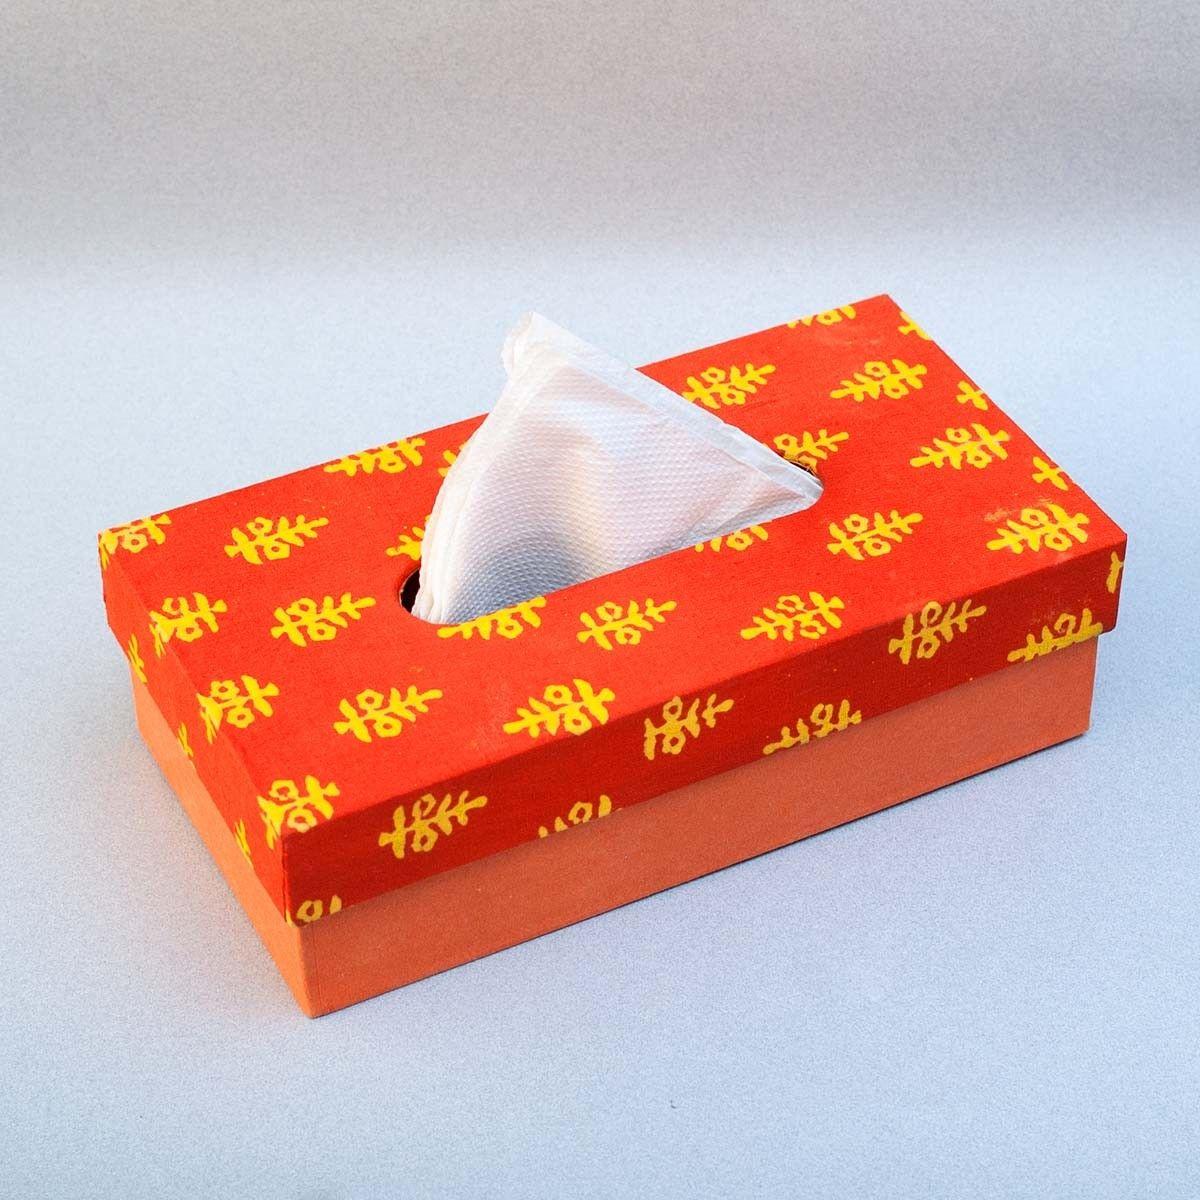 Orange Printed Fabric Cover Tissue Box - 9.5 x 2.5 x 5 Inch